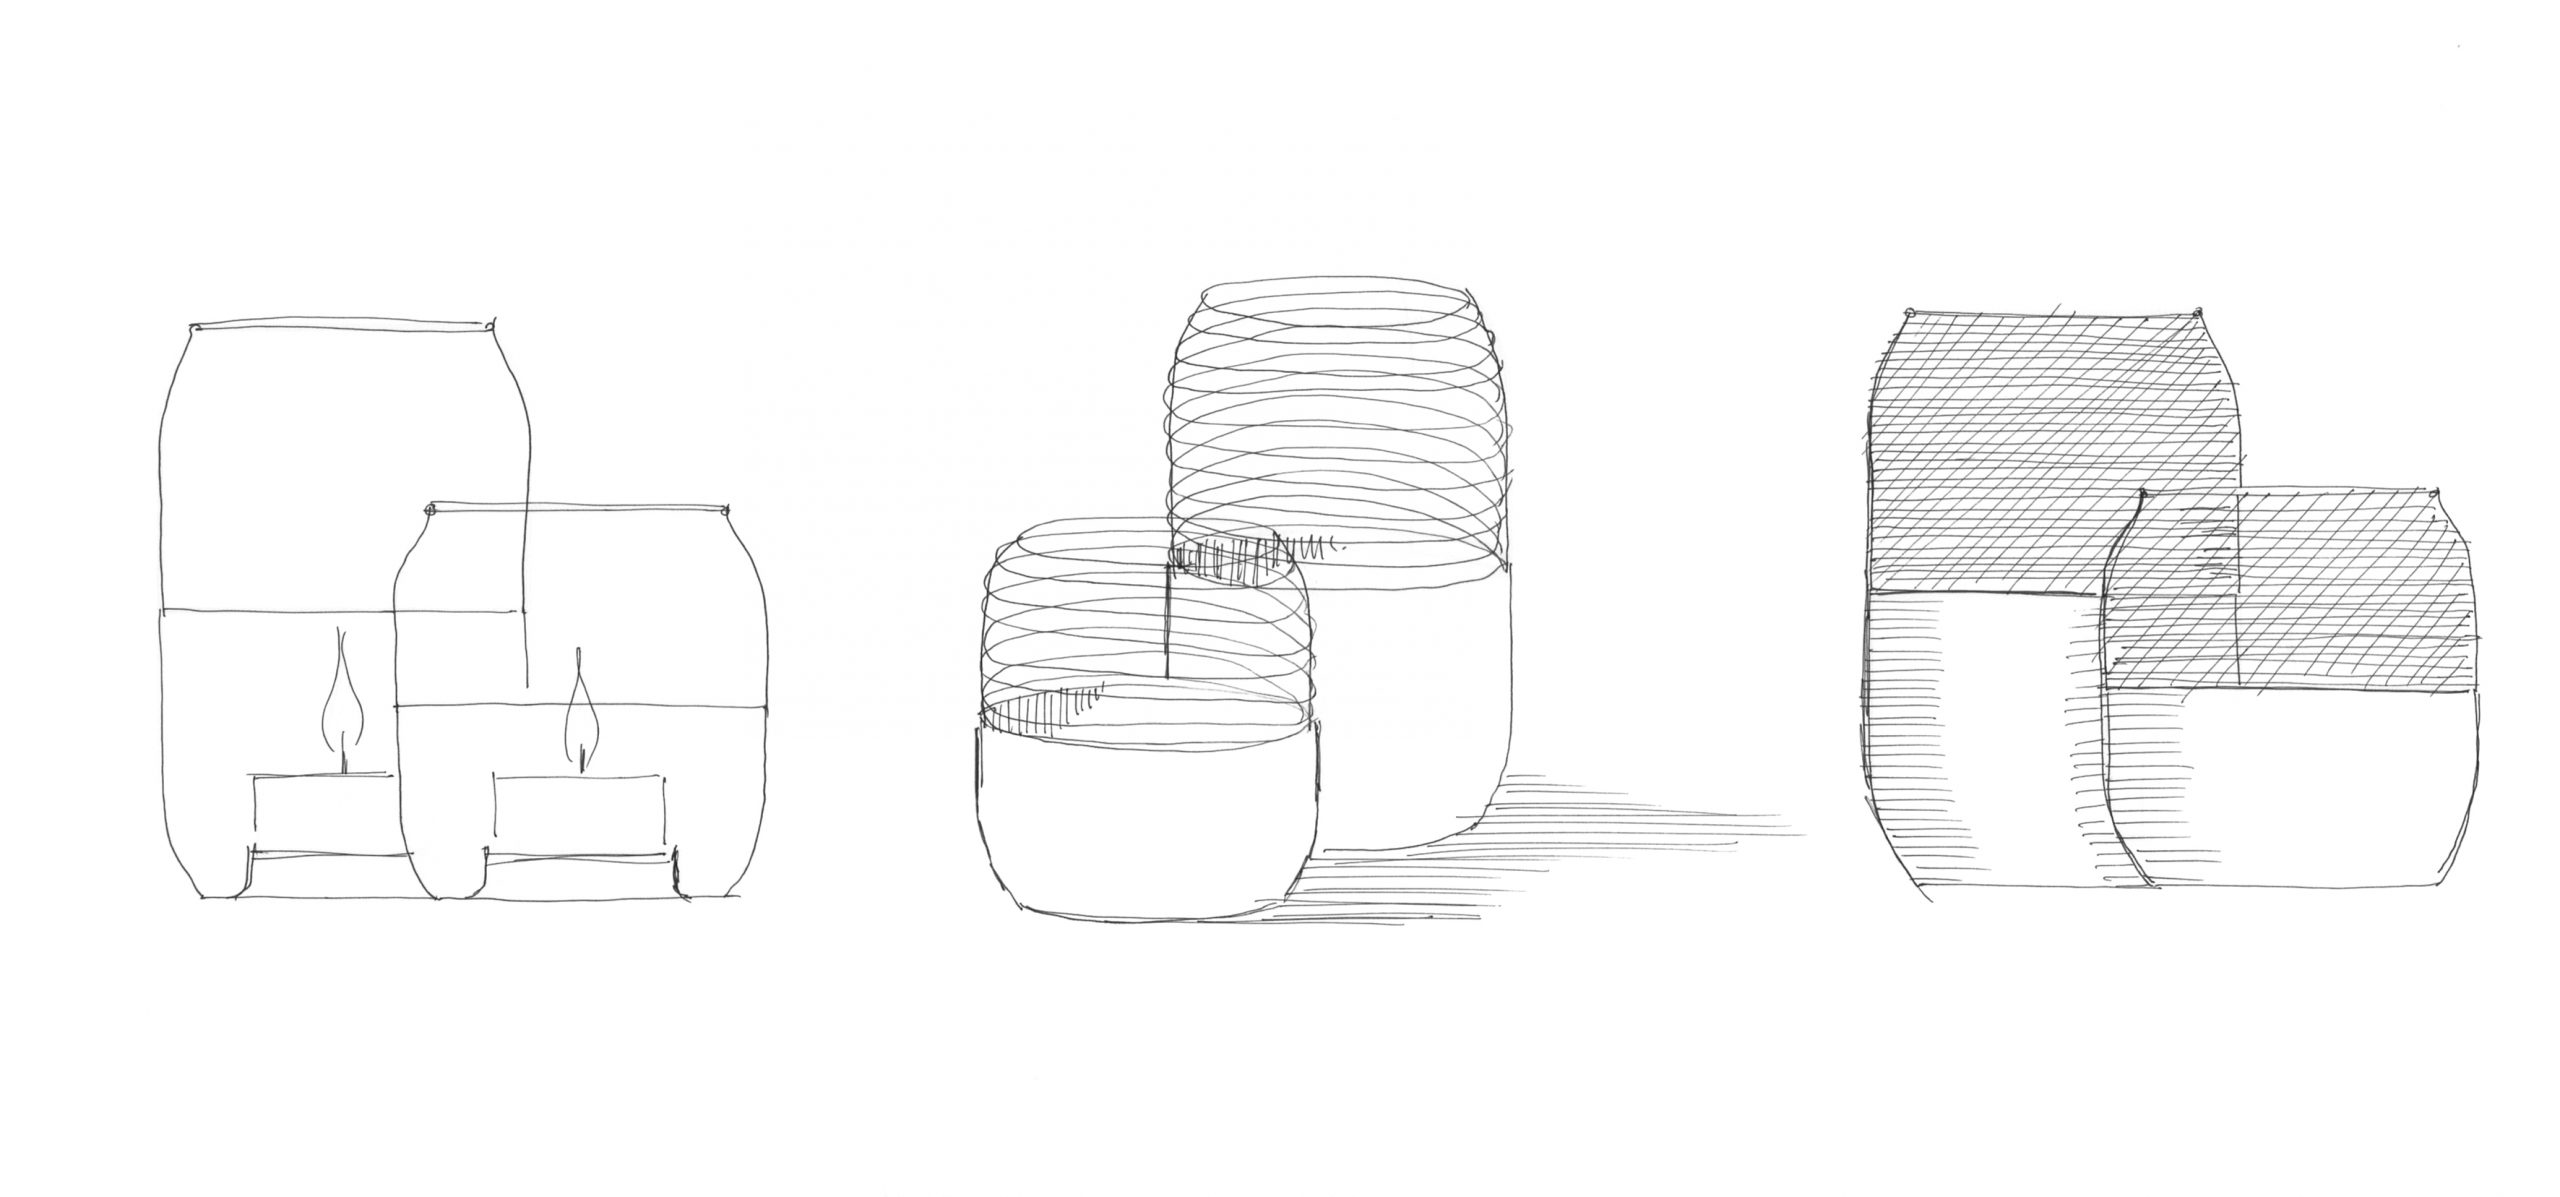 Sketch of the Collar Mesh Tealight holder by Debiasi Sandri for Stelton